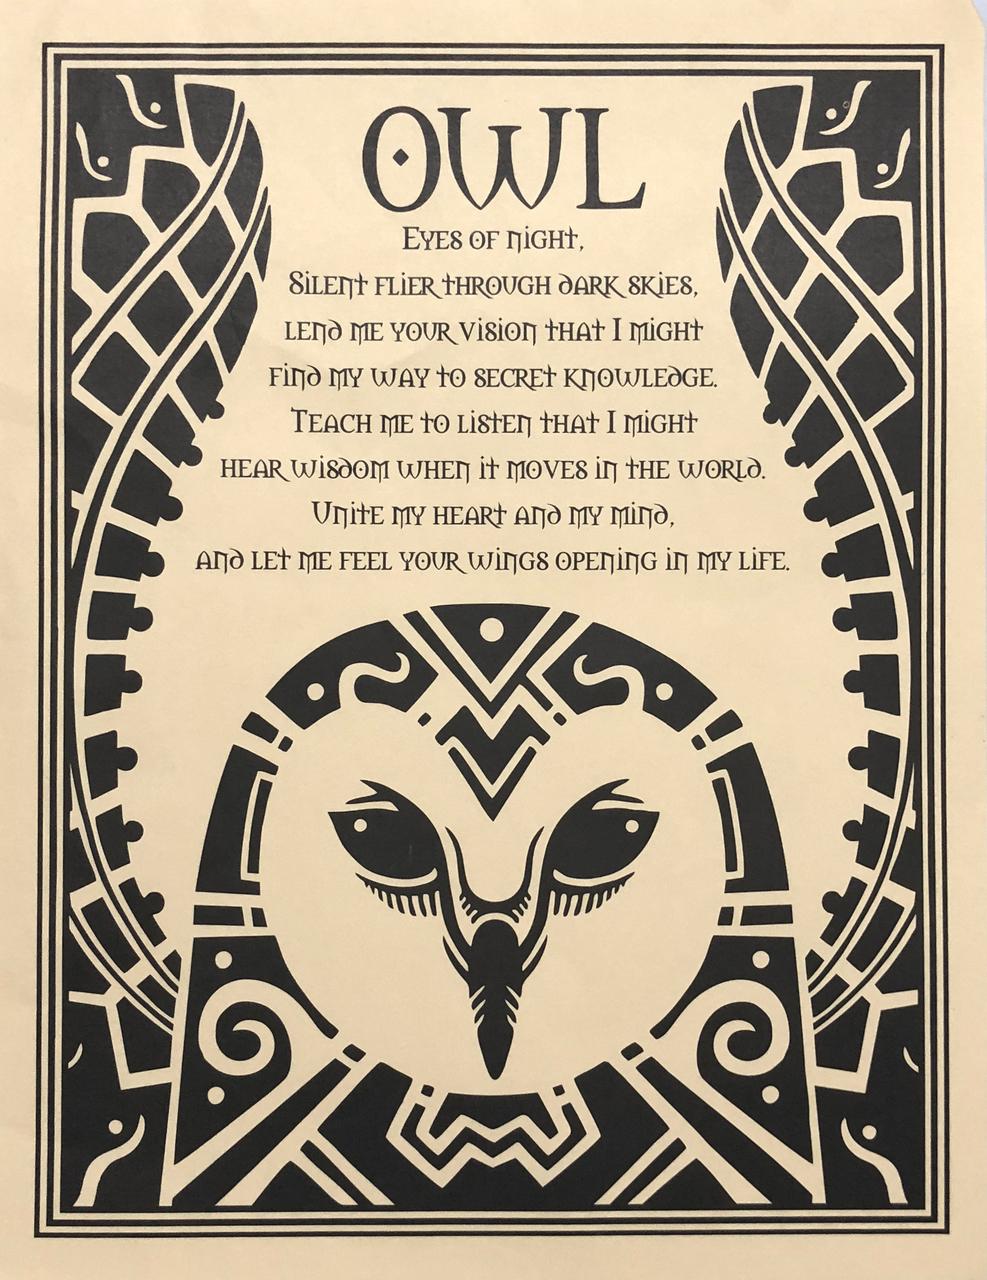 Owl Prayer Poster Image